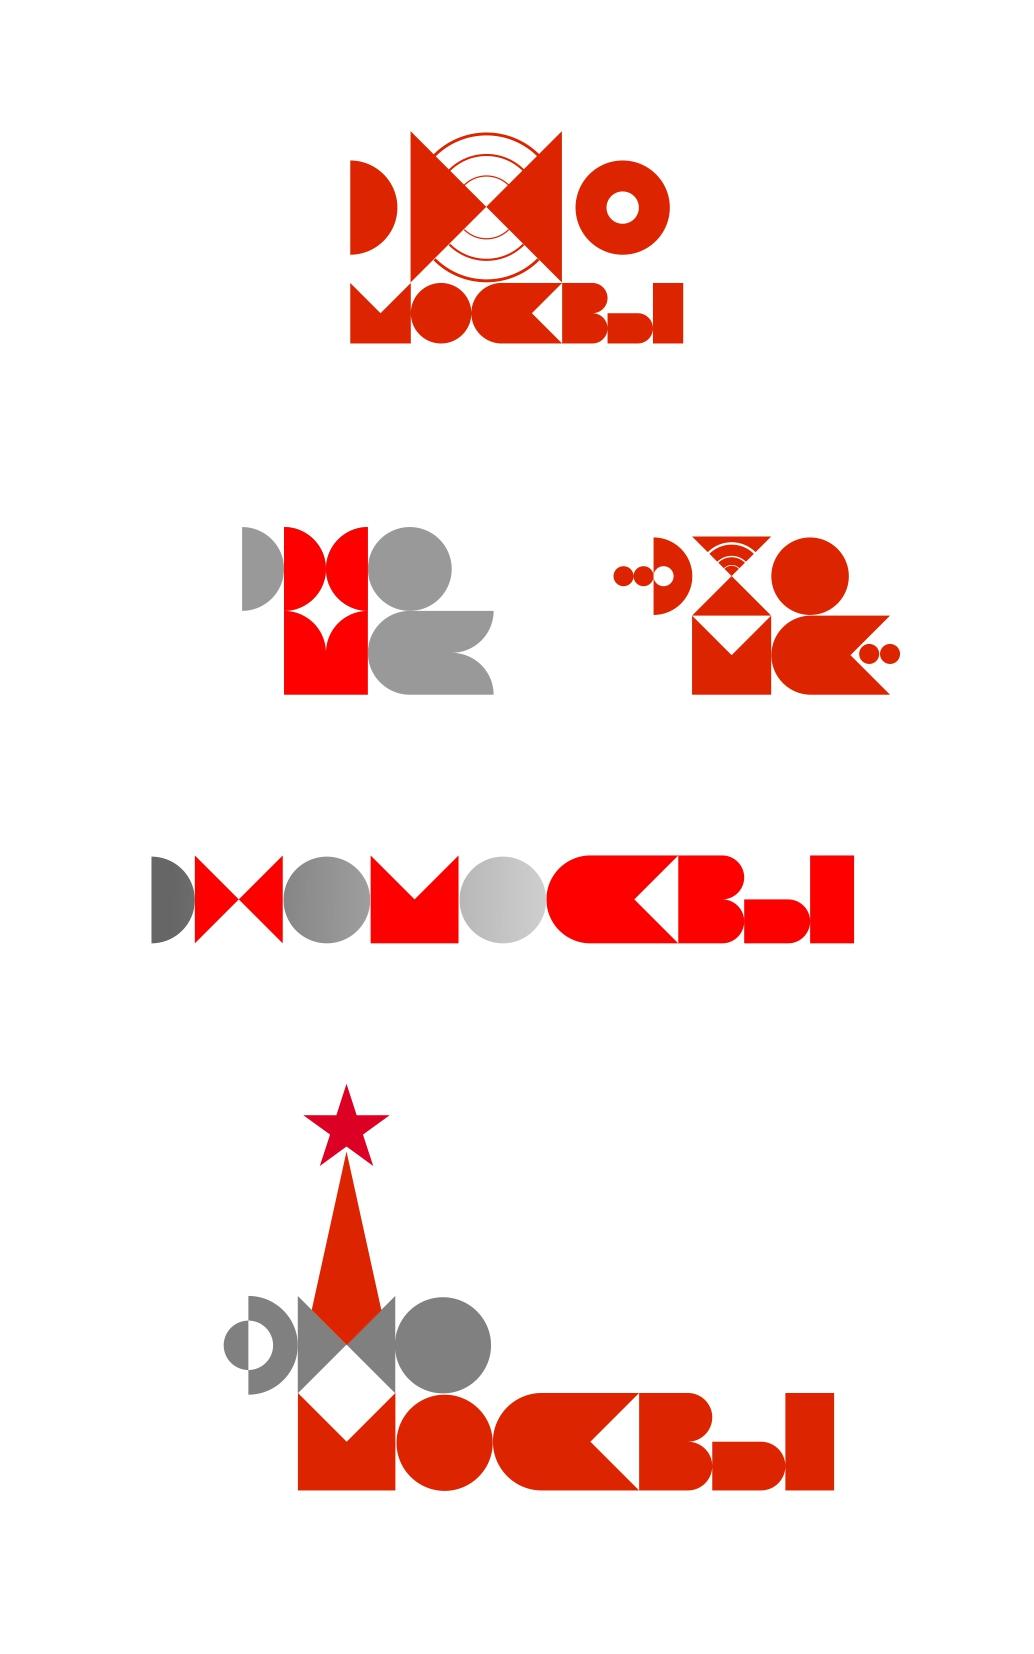 Дизайн логотипа р/с Эхо Москвы. фото f_8025625144e2438a.jpg